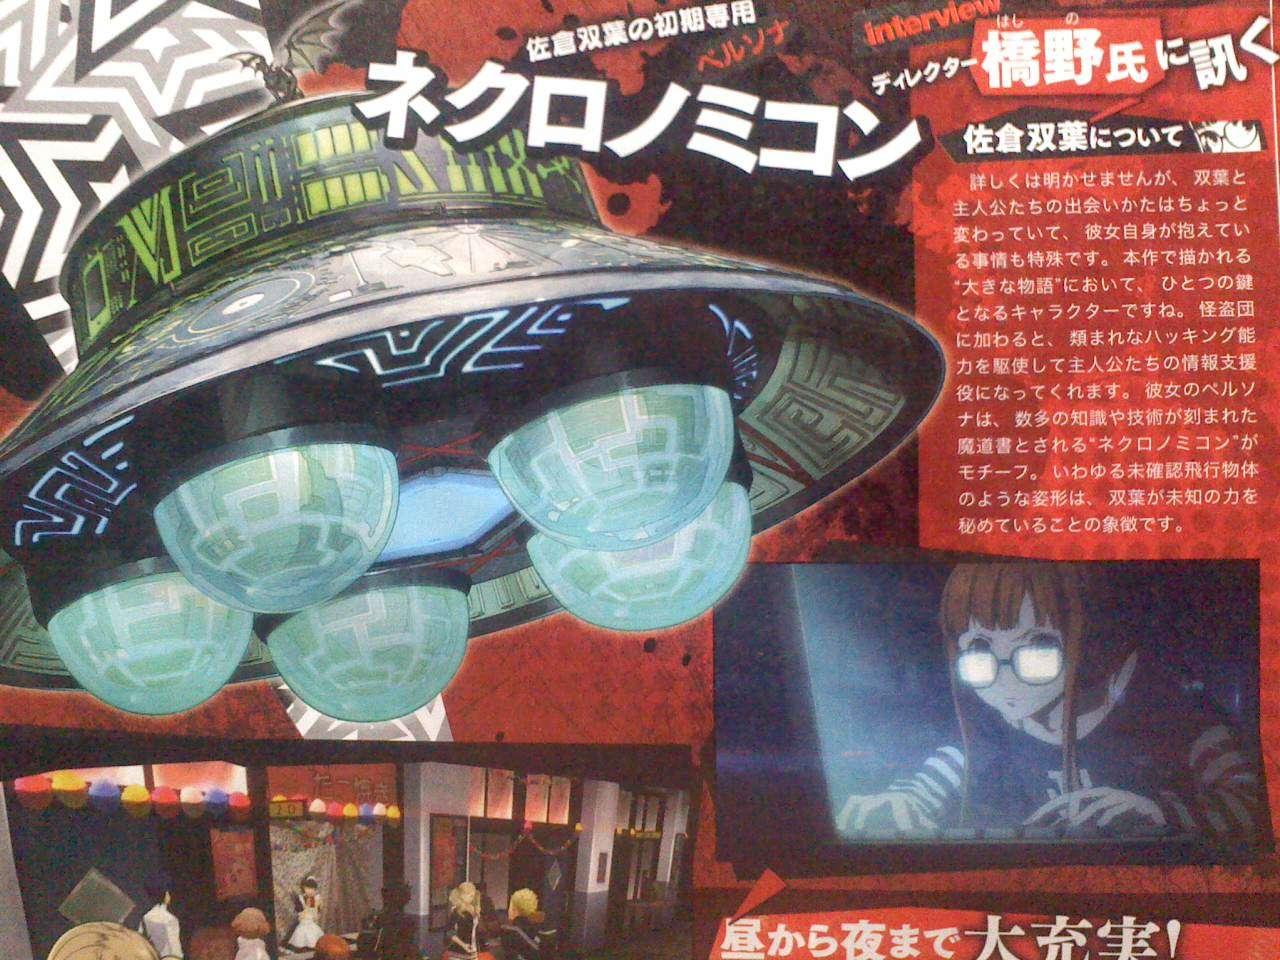 Persona-5-Famitsu-Scan-6.jpg